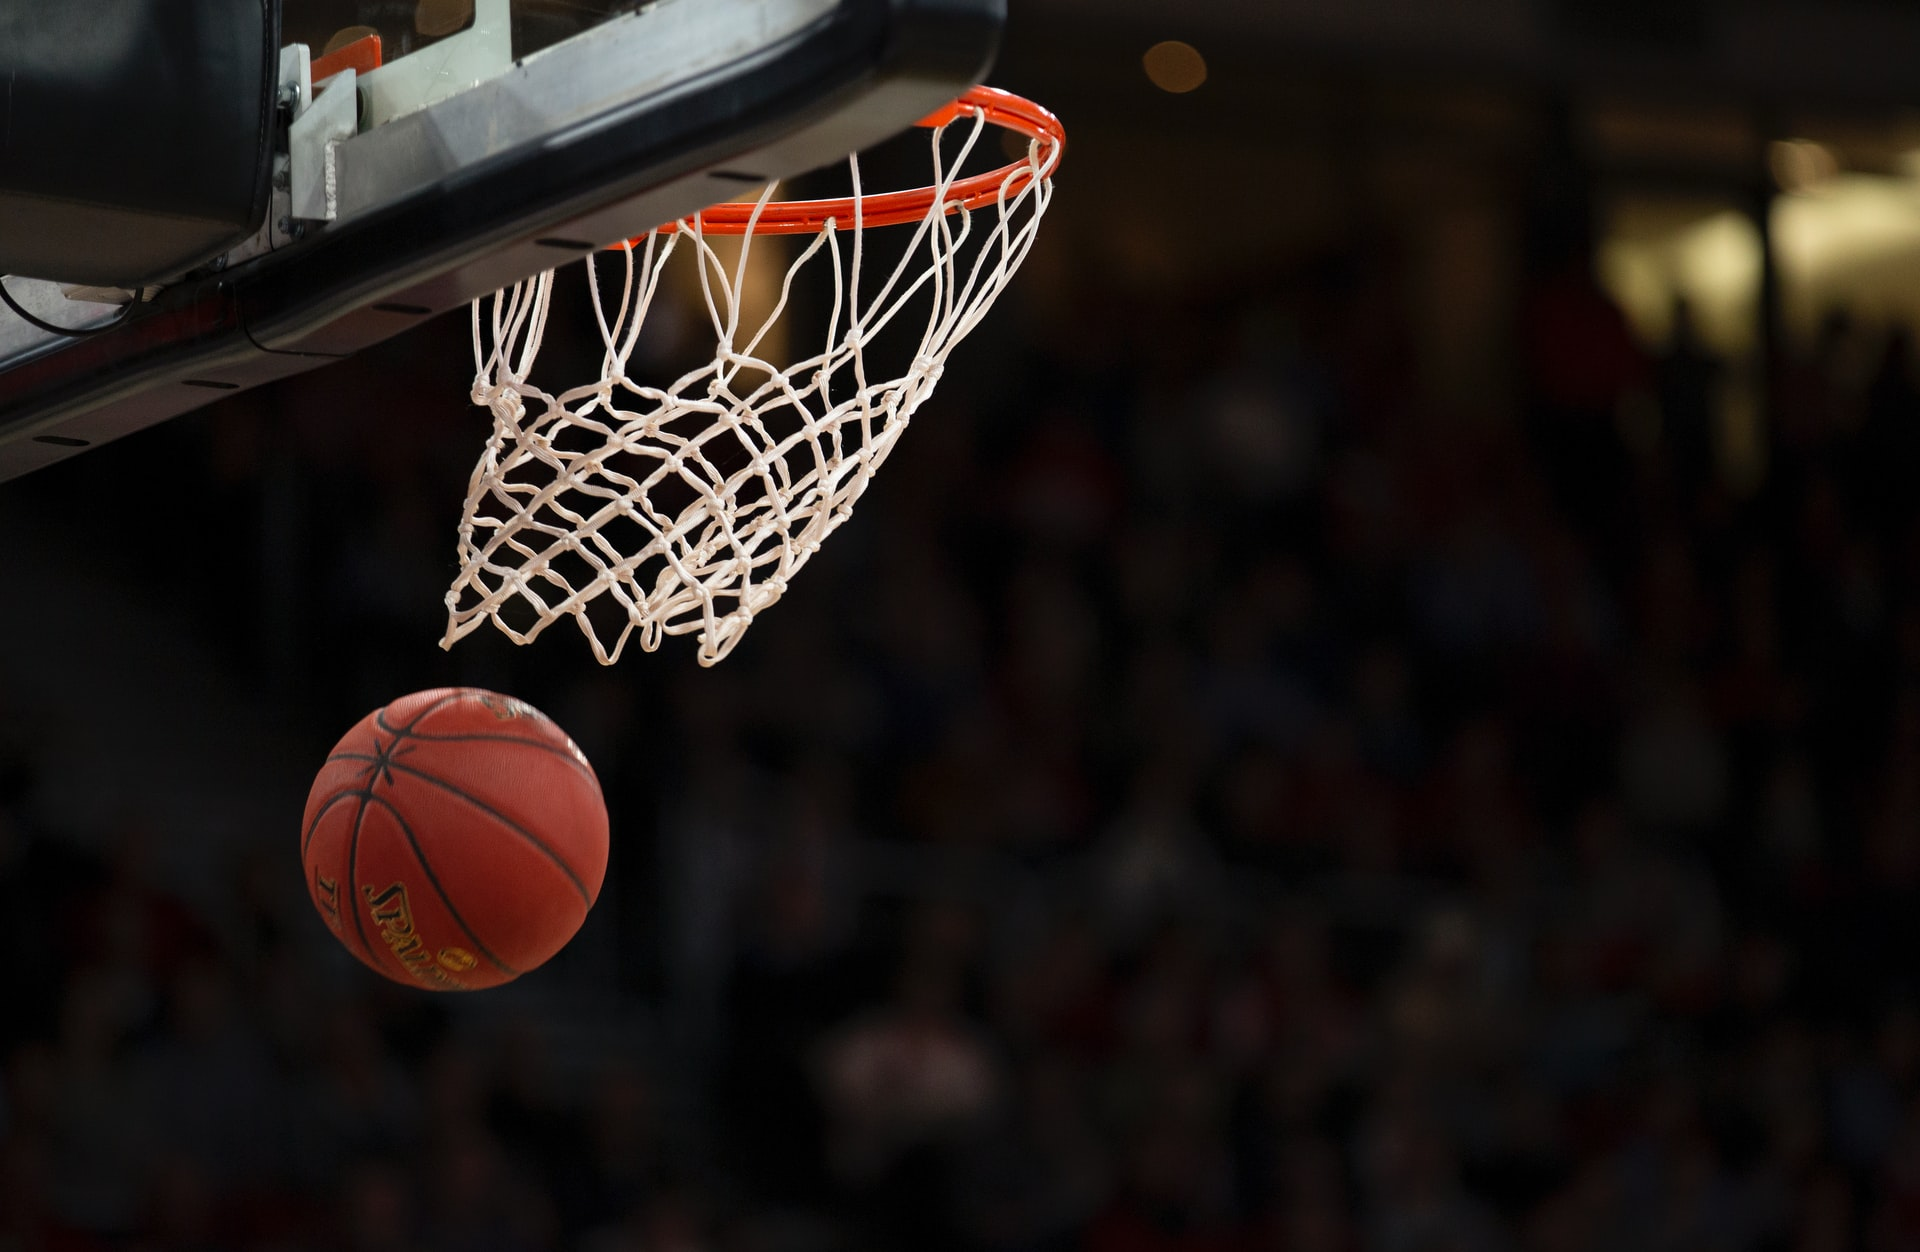 Photo of a basketball going through a hoop